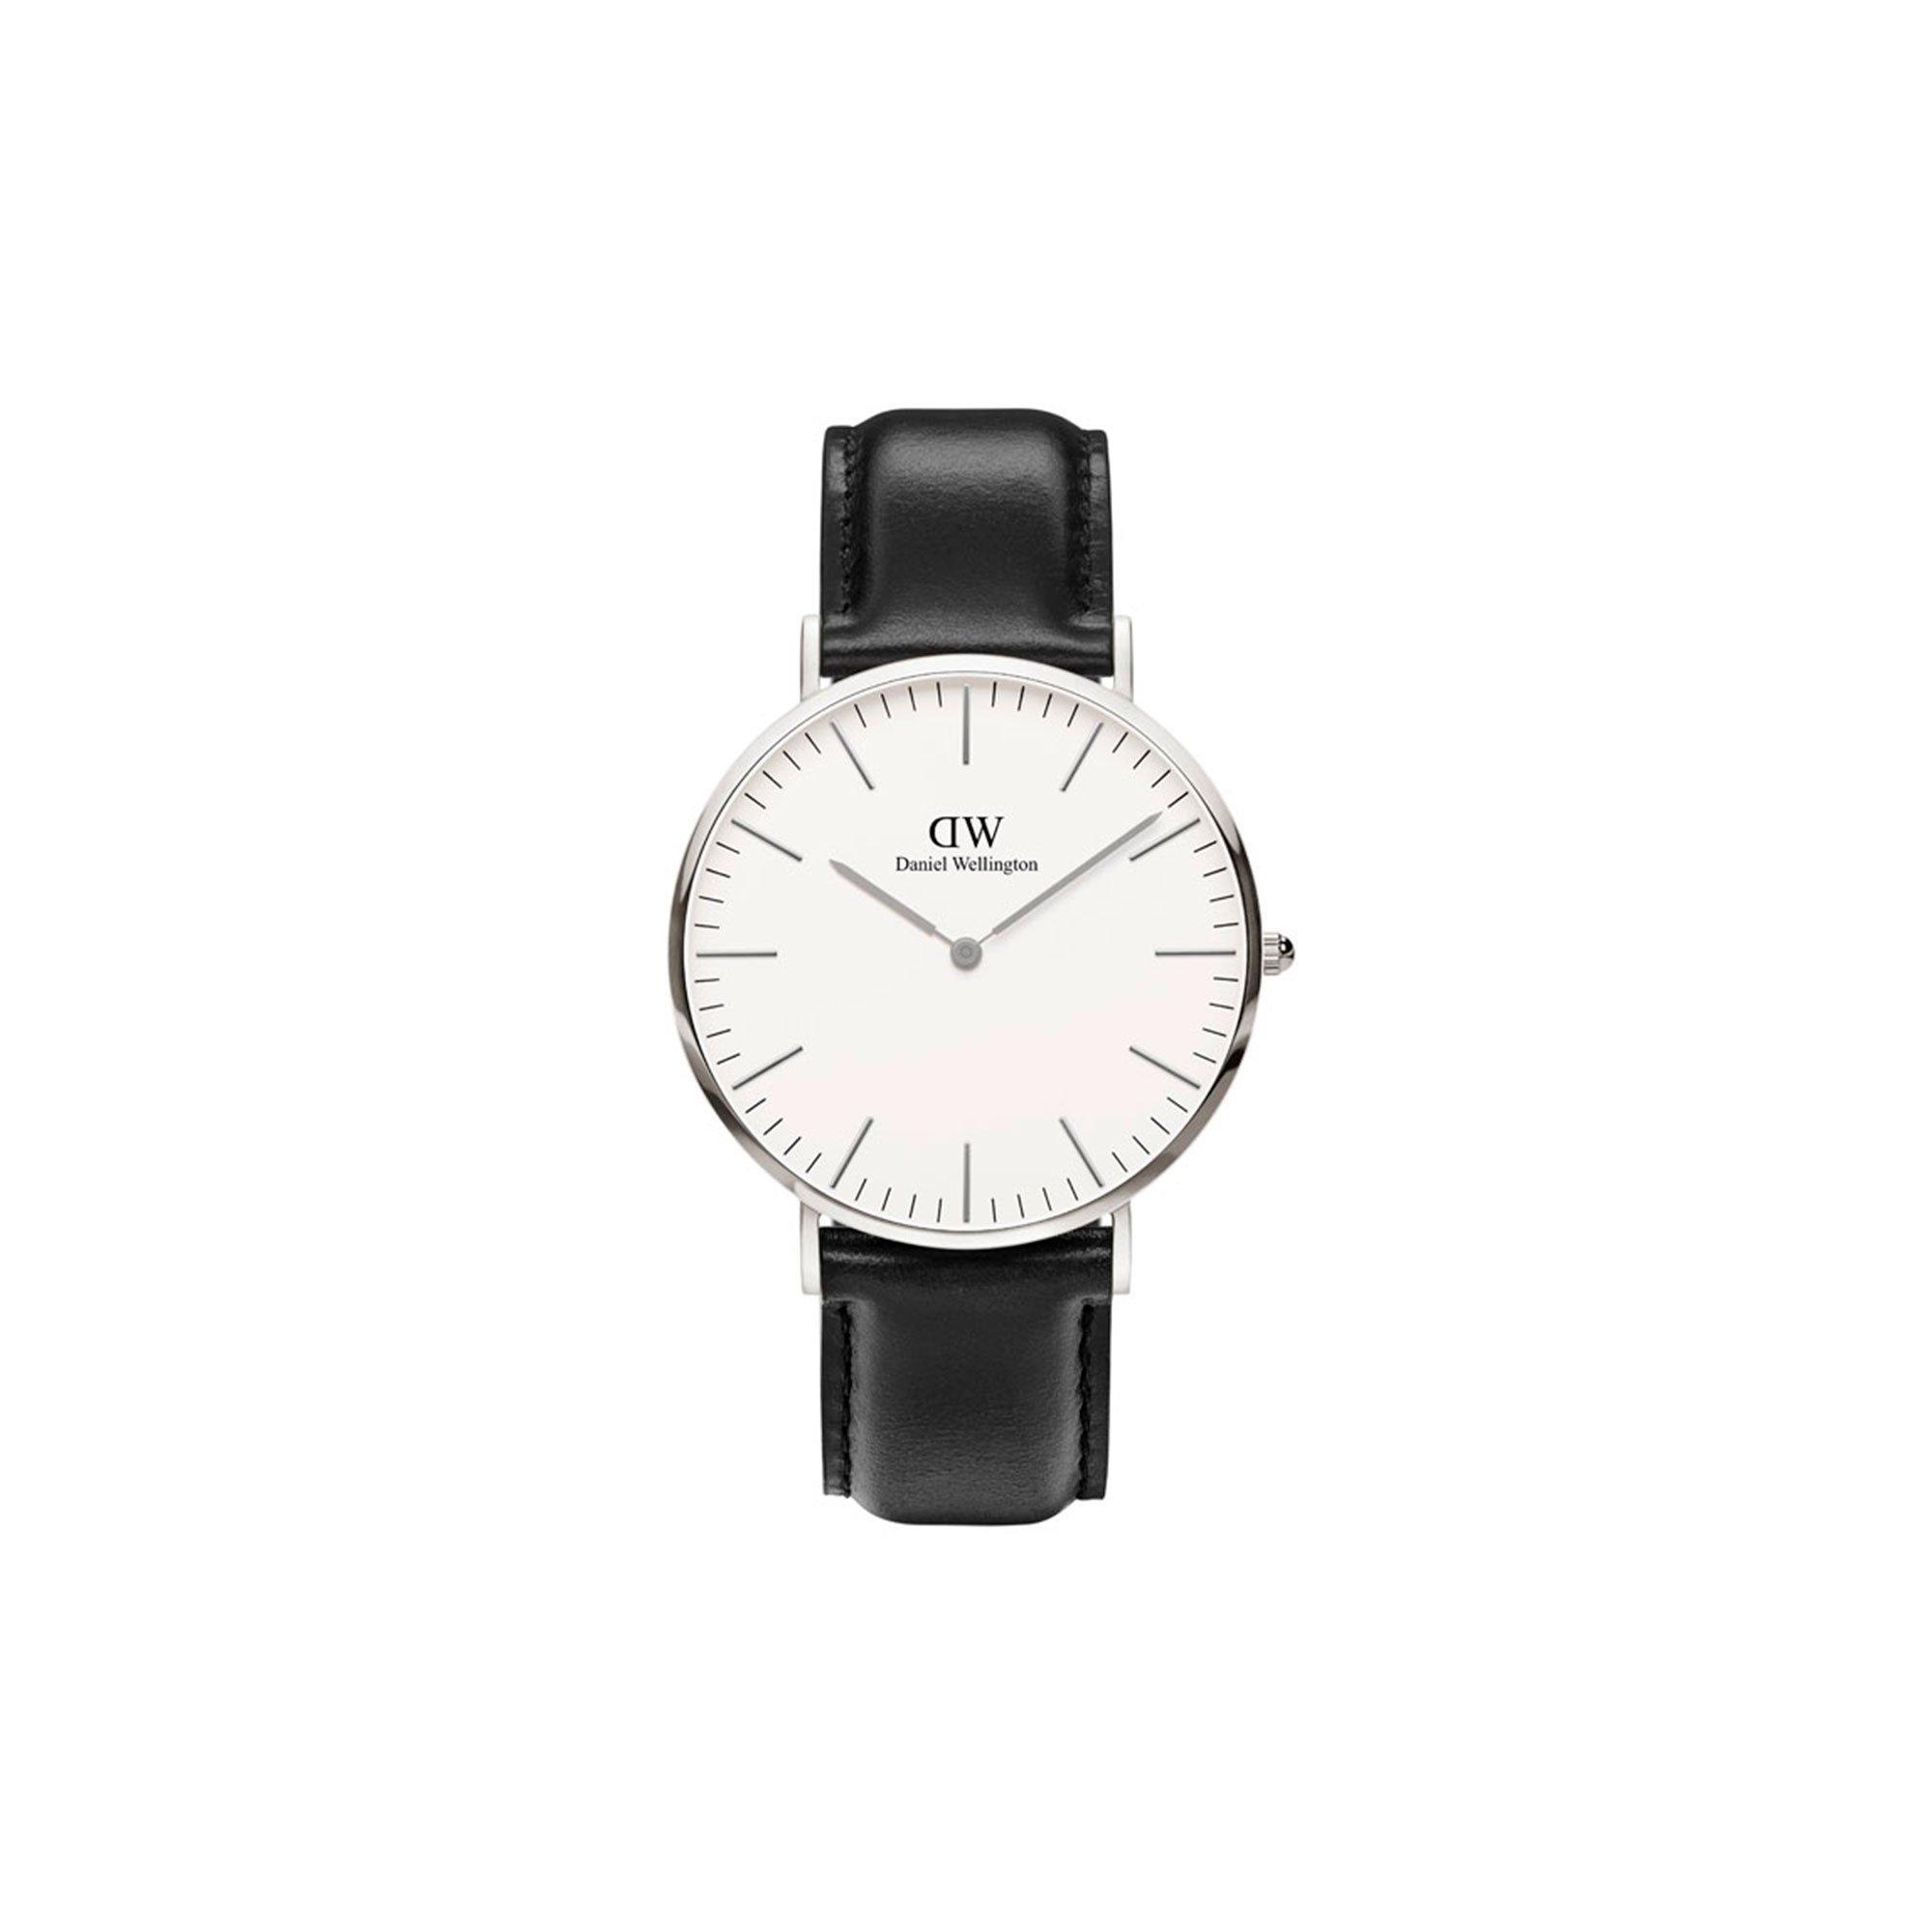 Daniel Wellington Trenduhren  Herren Analog Quarz Uhr mit Leder Armband DW00100020